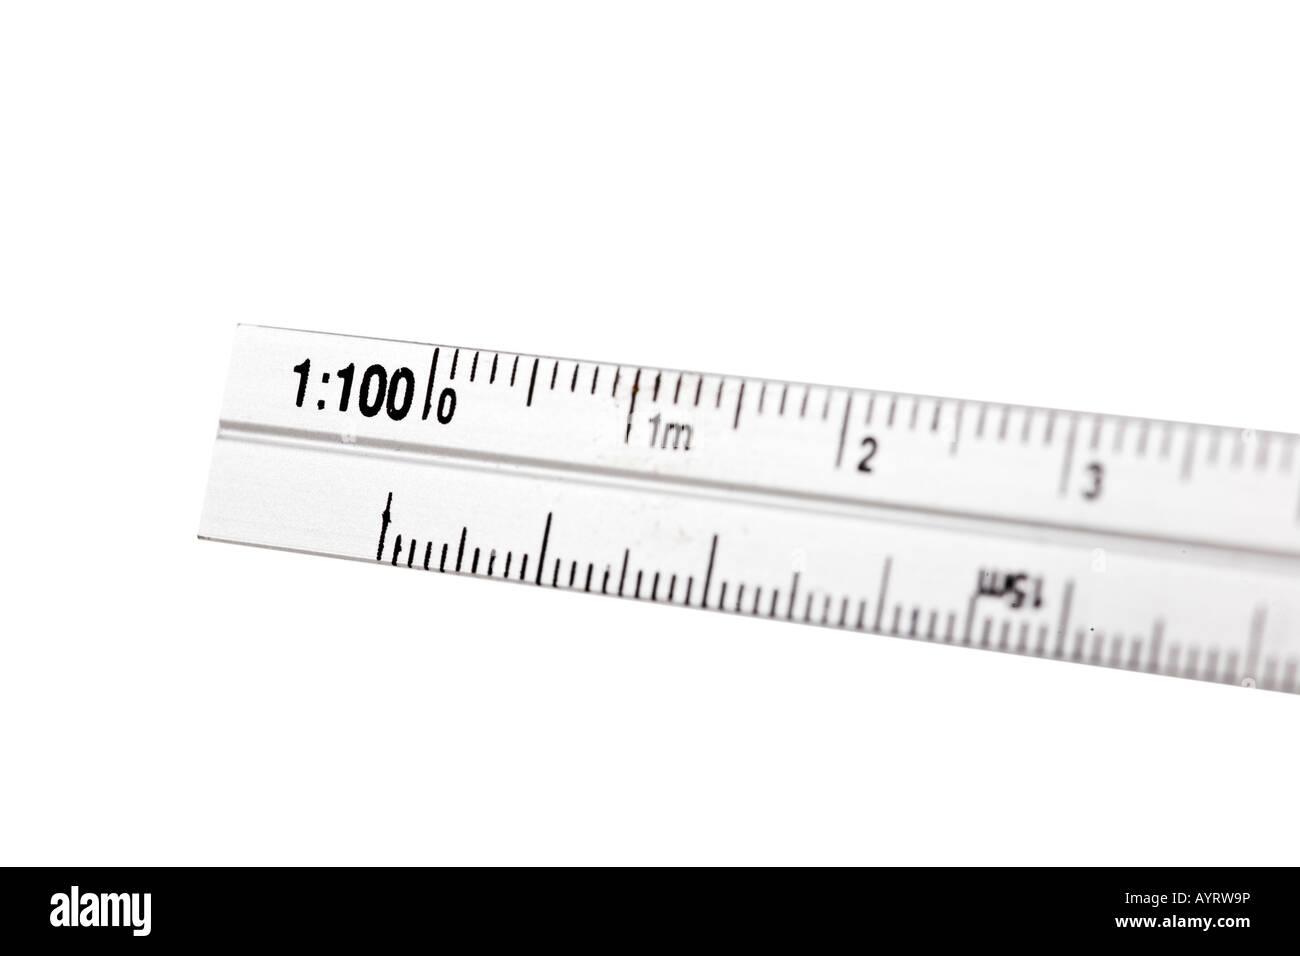 Aluminum ruler with scale isolated on white background - Stock Image